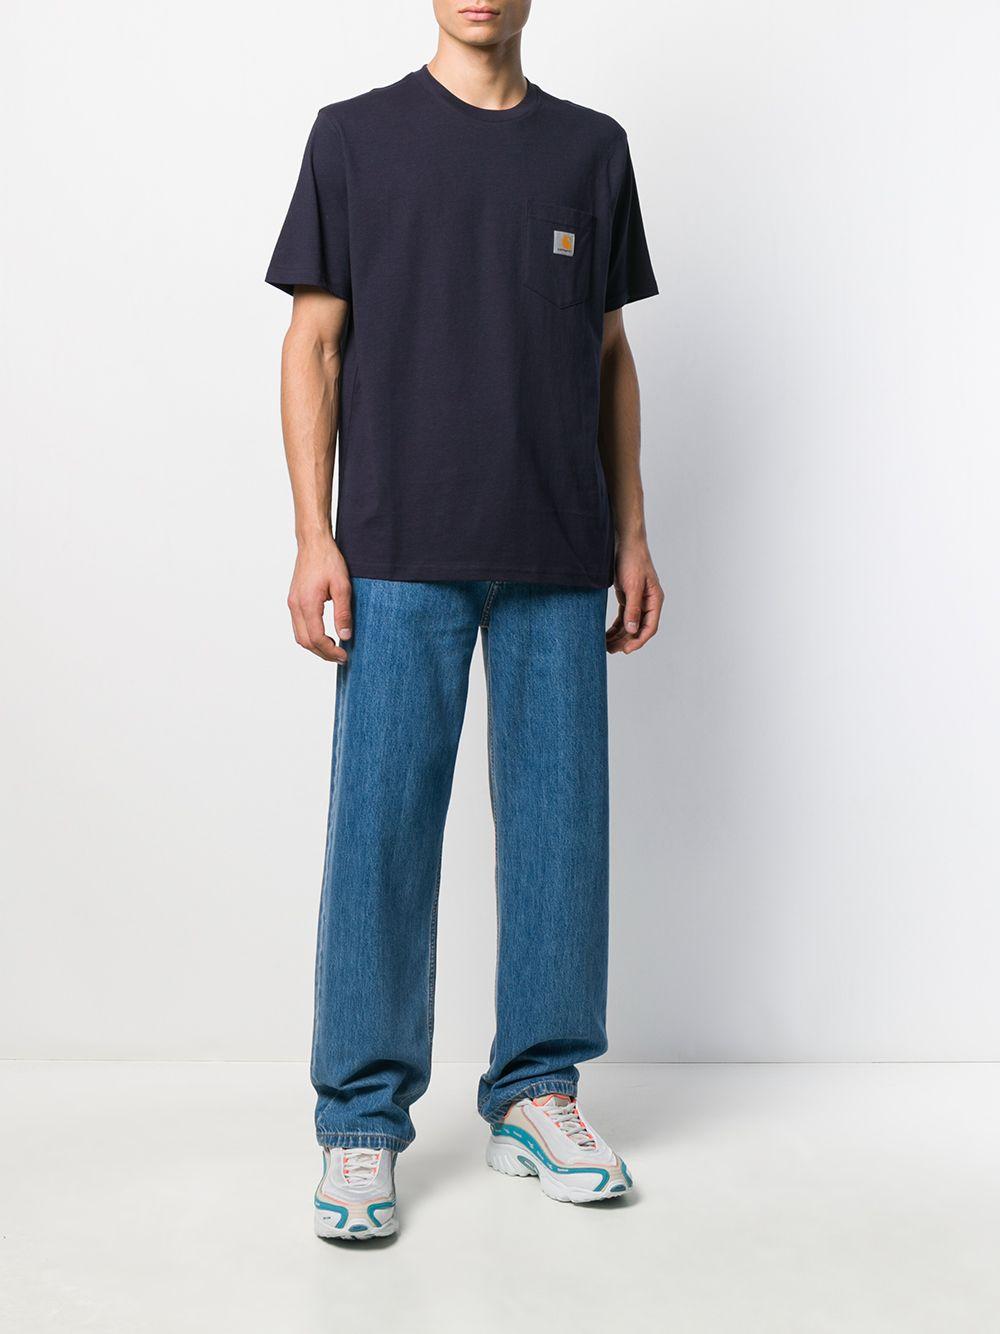 POCKET T-SHIRT CARHARTT | T-shirts | I0220911C.00